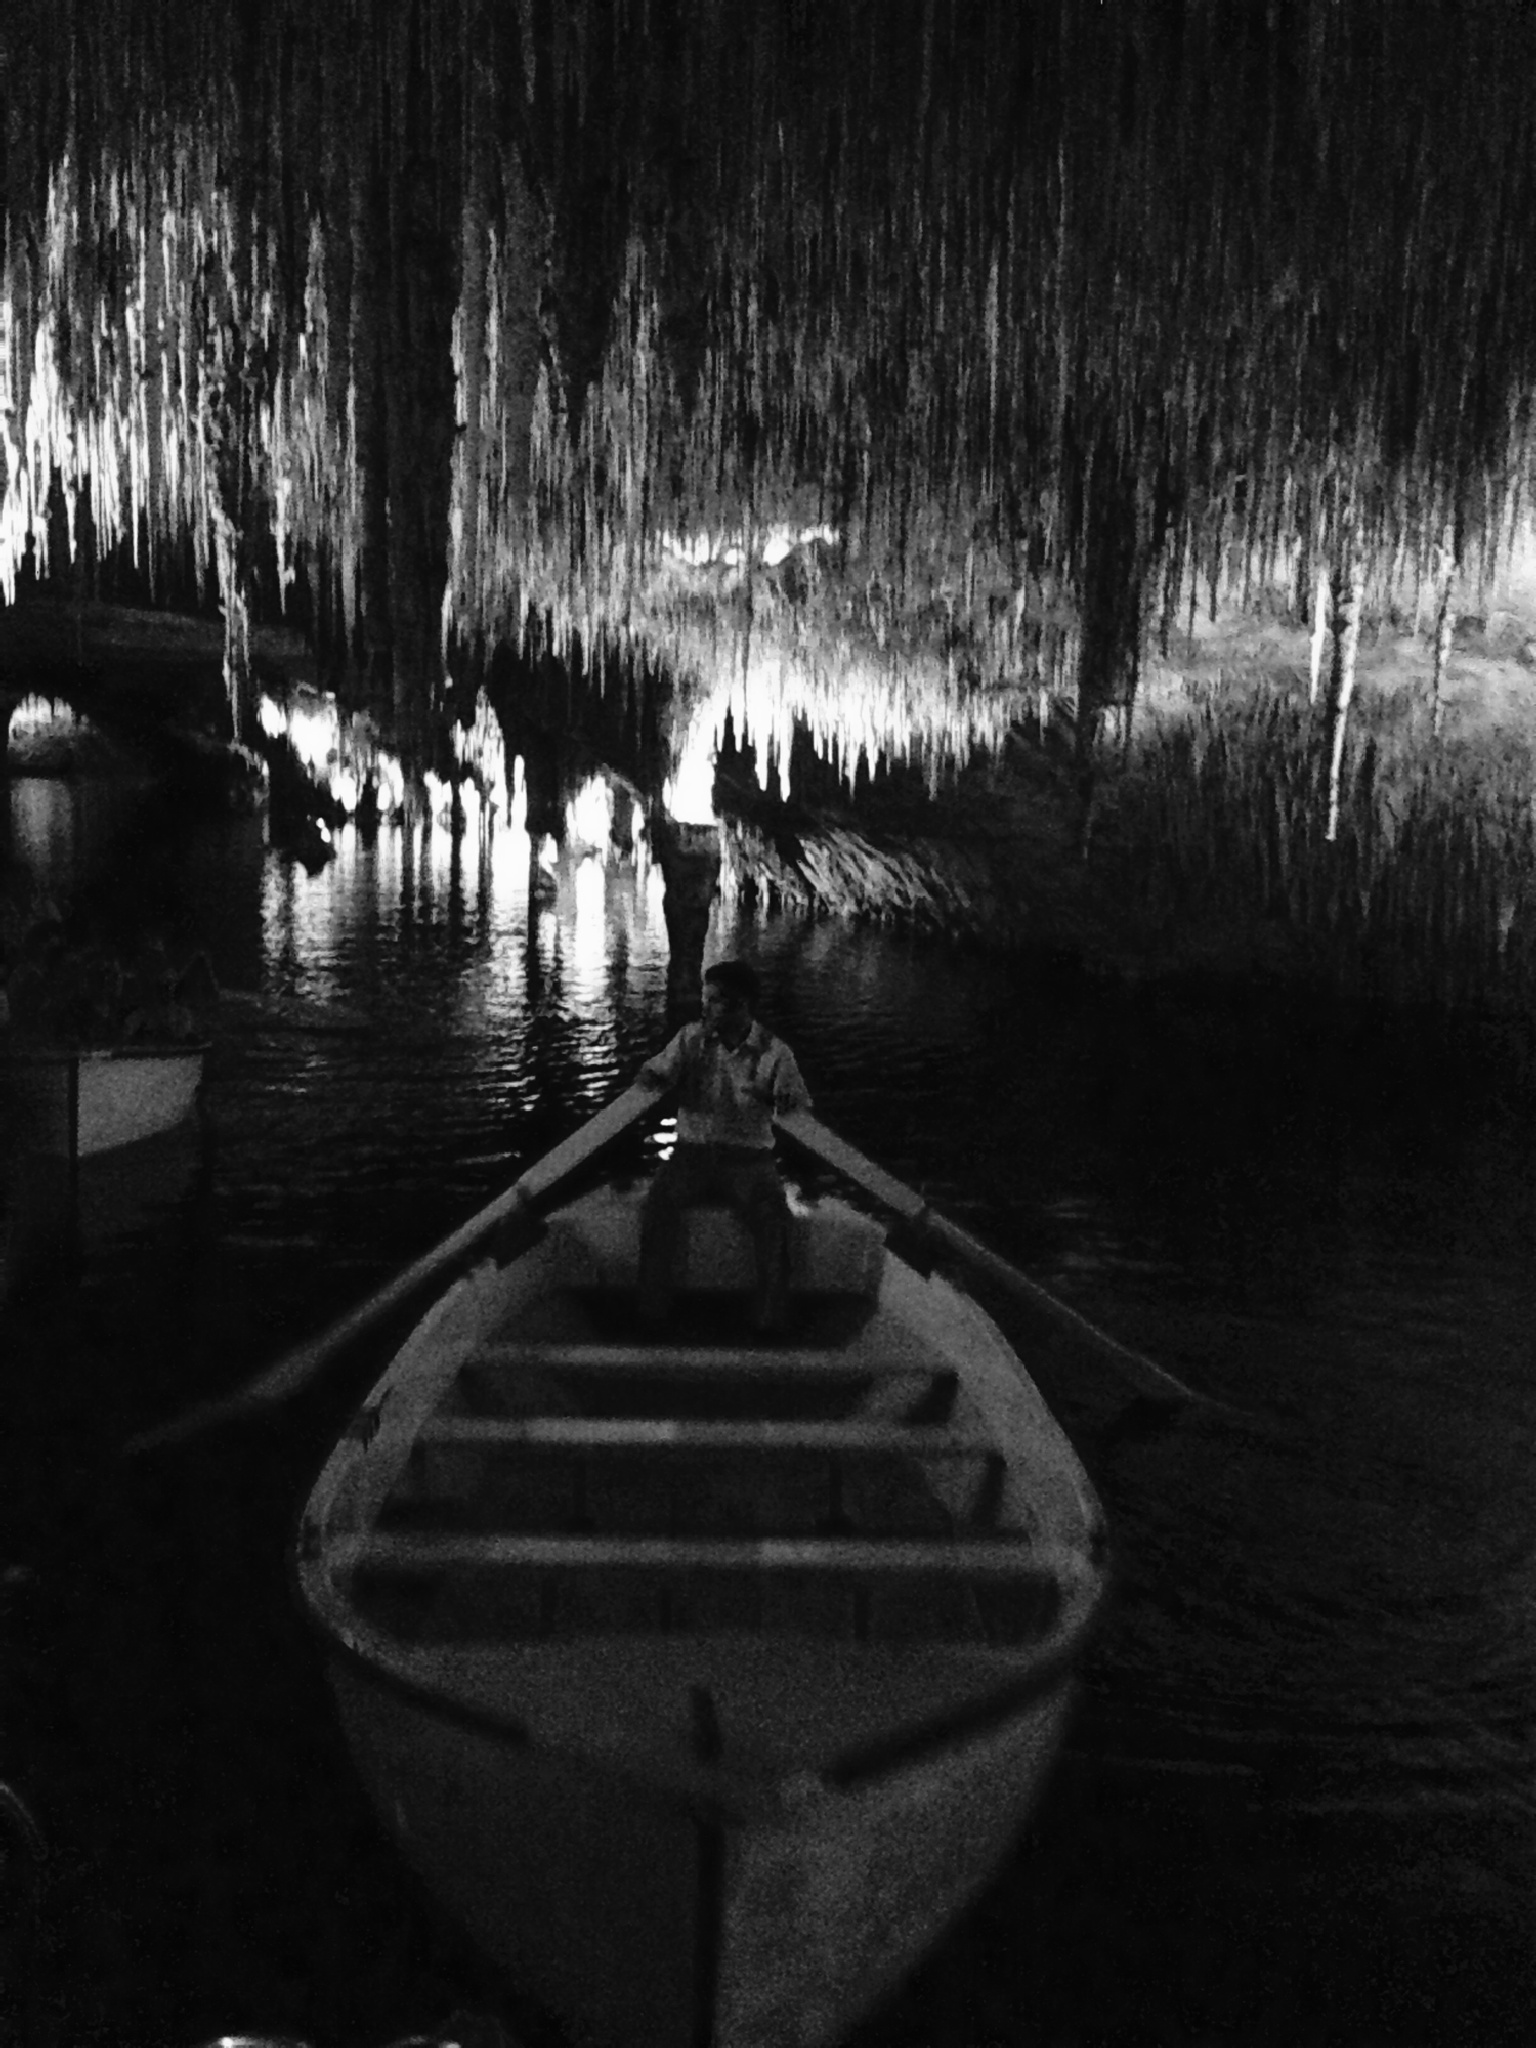 Romantic Cave Ride by blackandwhitesoul.com